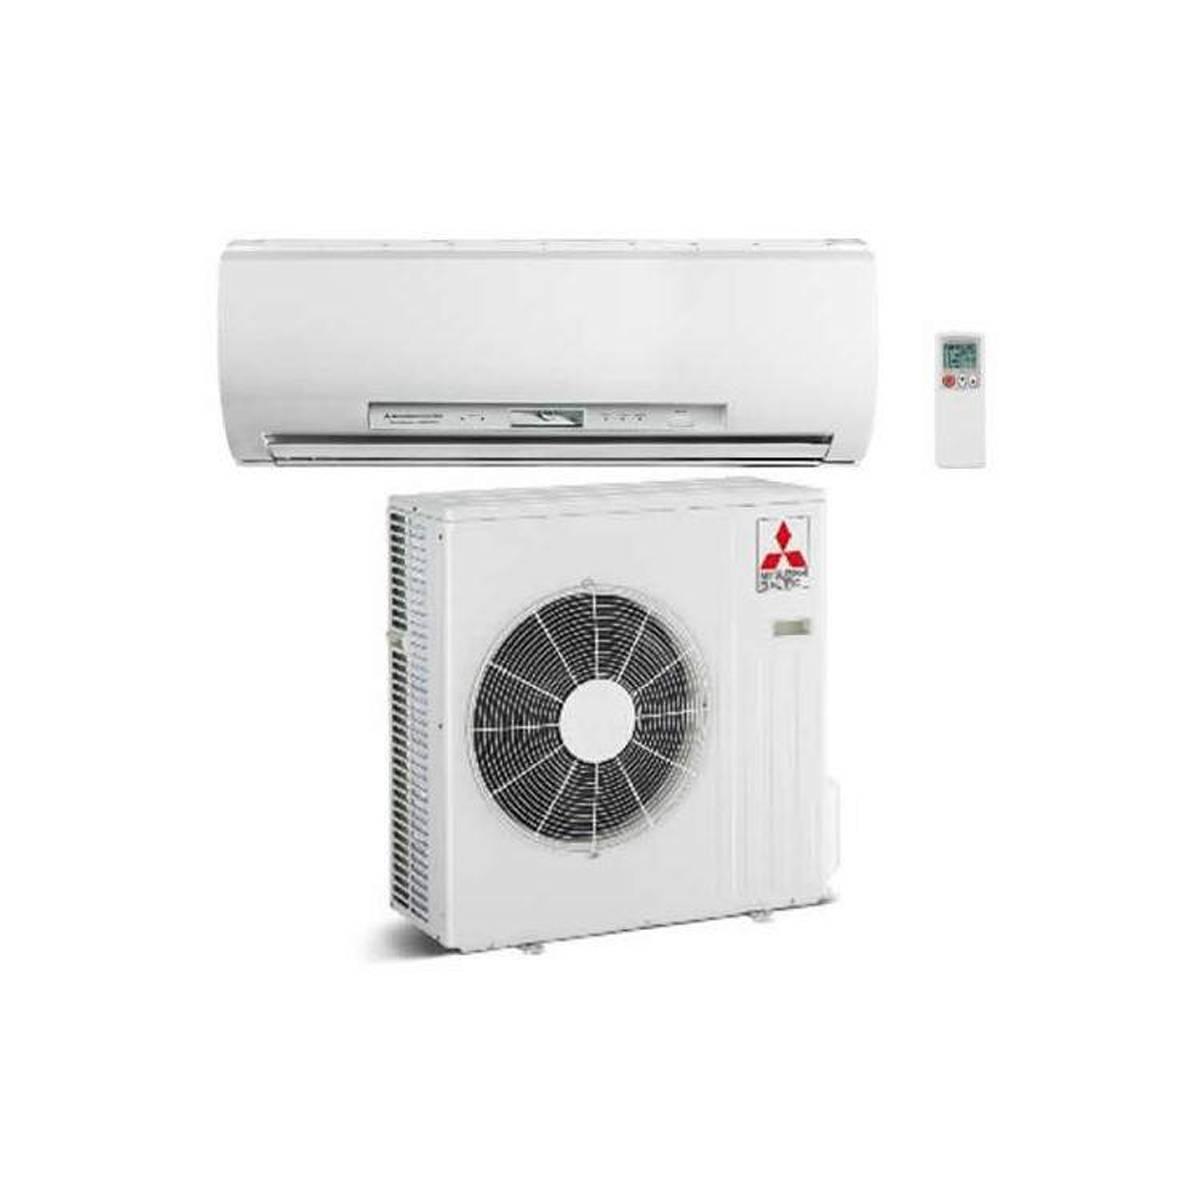 MITSUBISHI MSZ-FD 18000 BTU Kirigamine DC Inverter